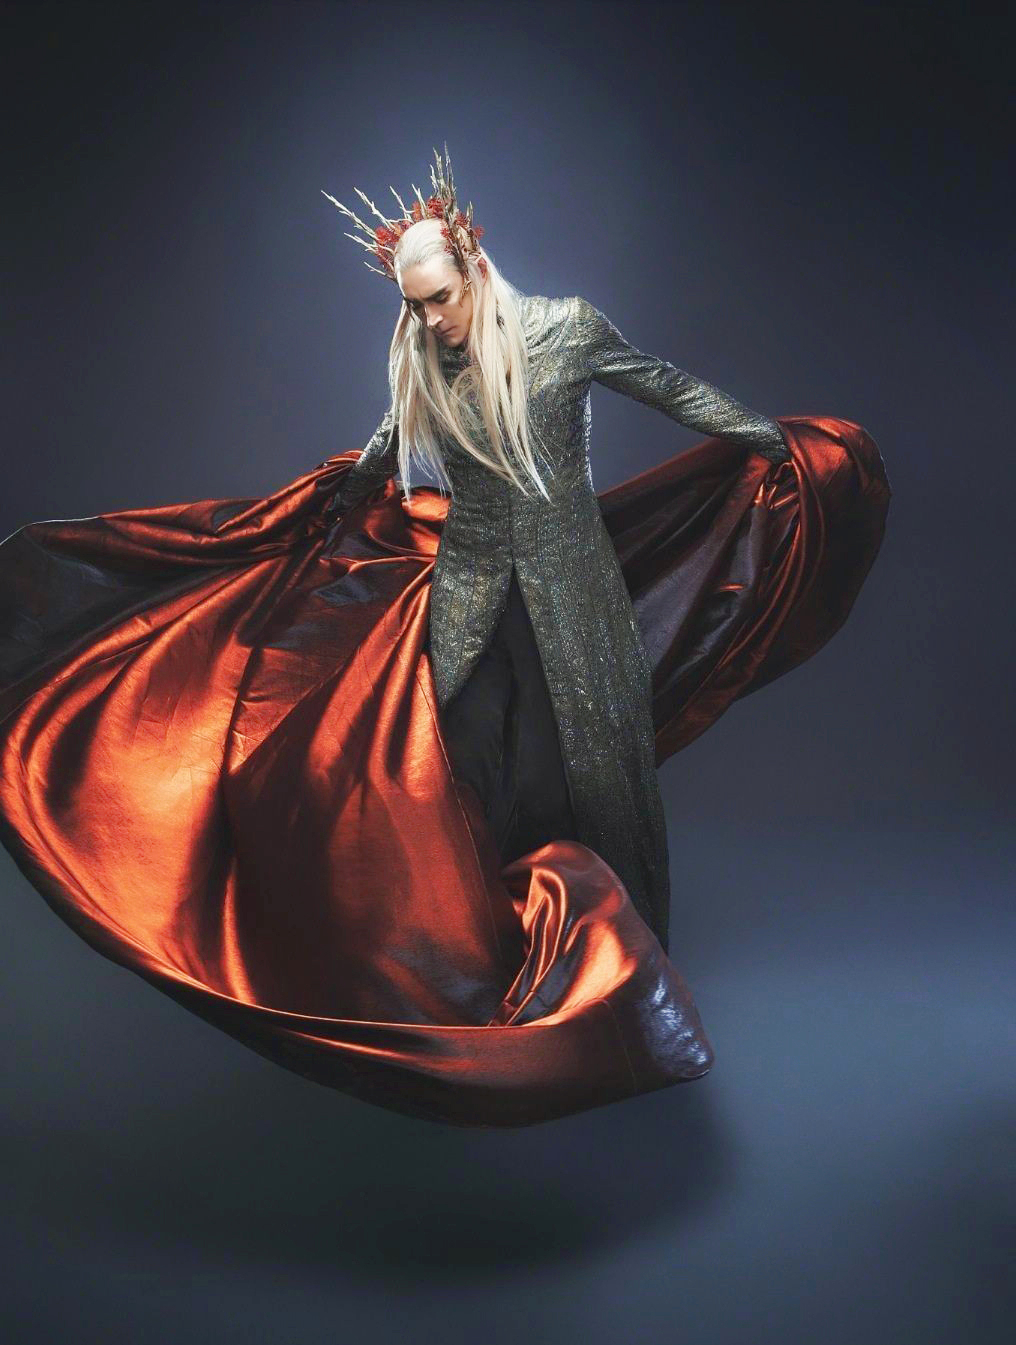 Elf arwen fucked sexy images